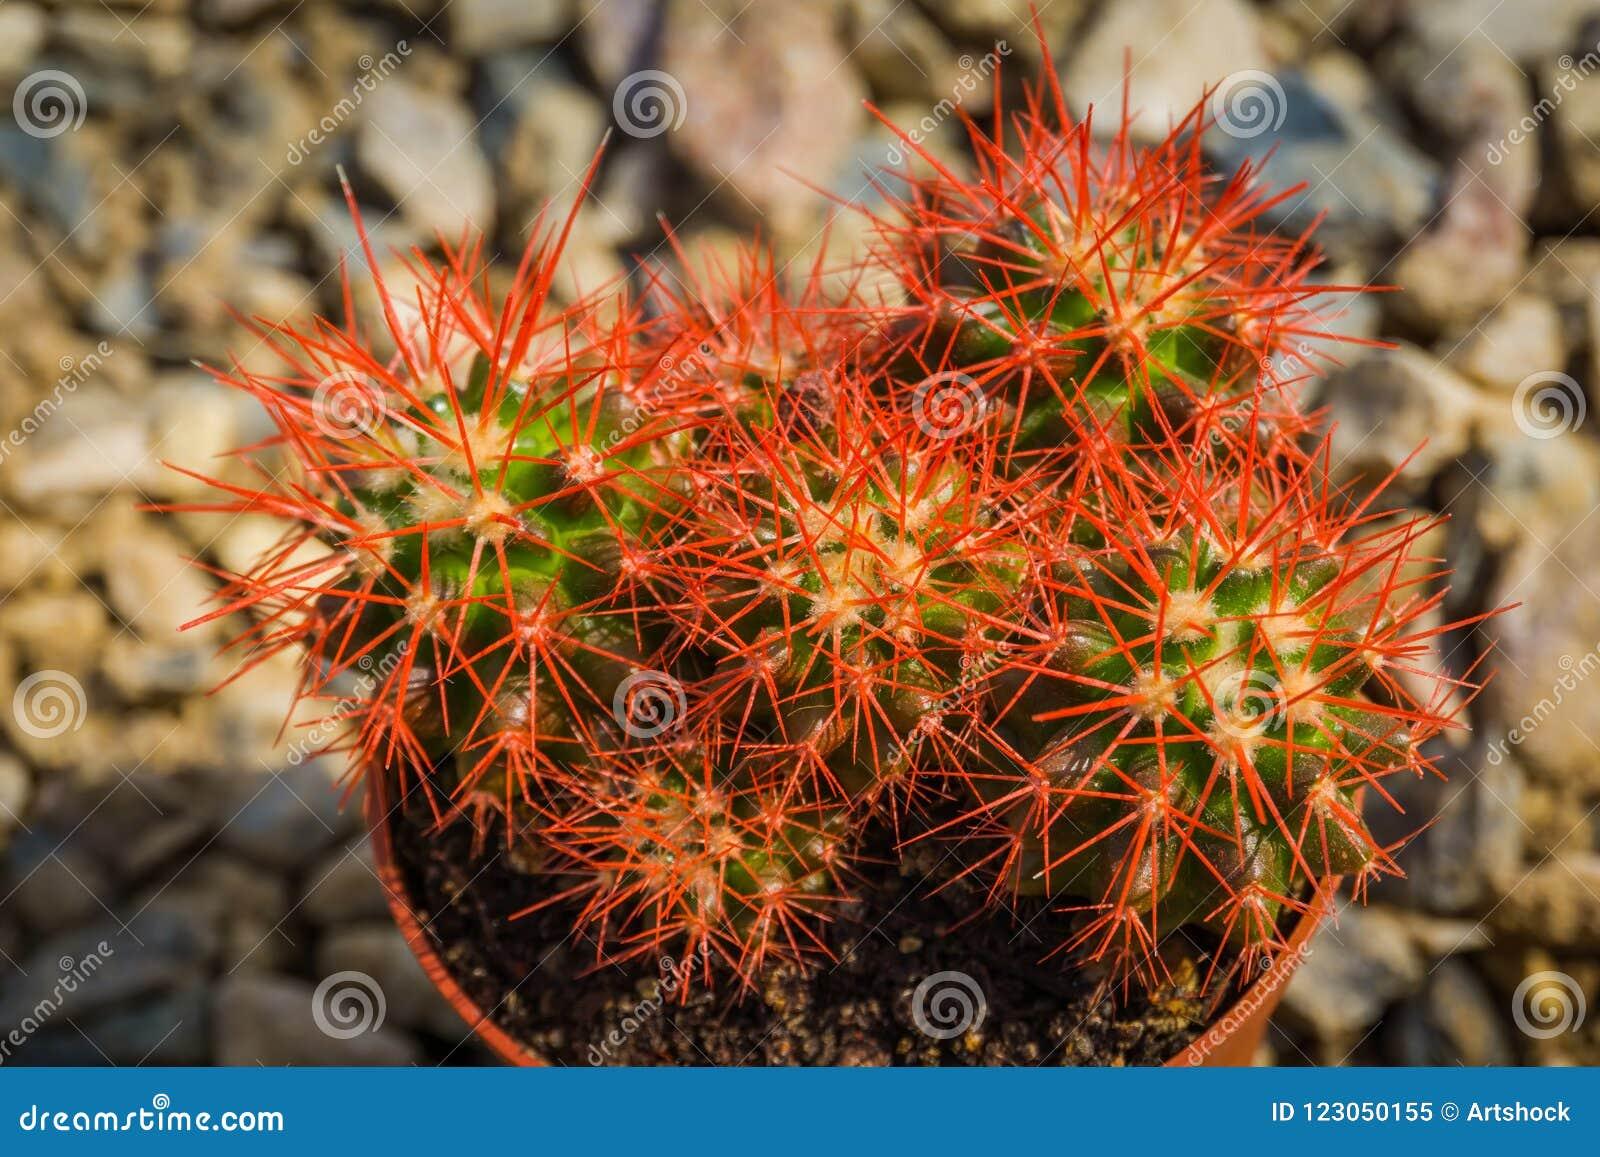 Grusonii rainbow cactus stock image. Image of sharp - 123050155 on elephant plant, aloe vera plant, skin care stonecrop plant, variegated jade plant, peperomia house plant, purple rose succulent plant, rainbow fern house plant,